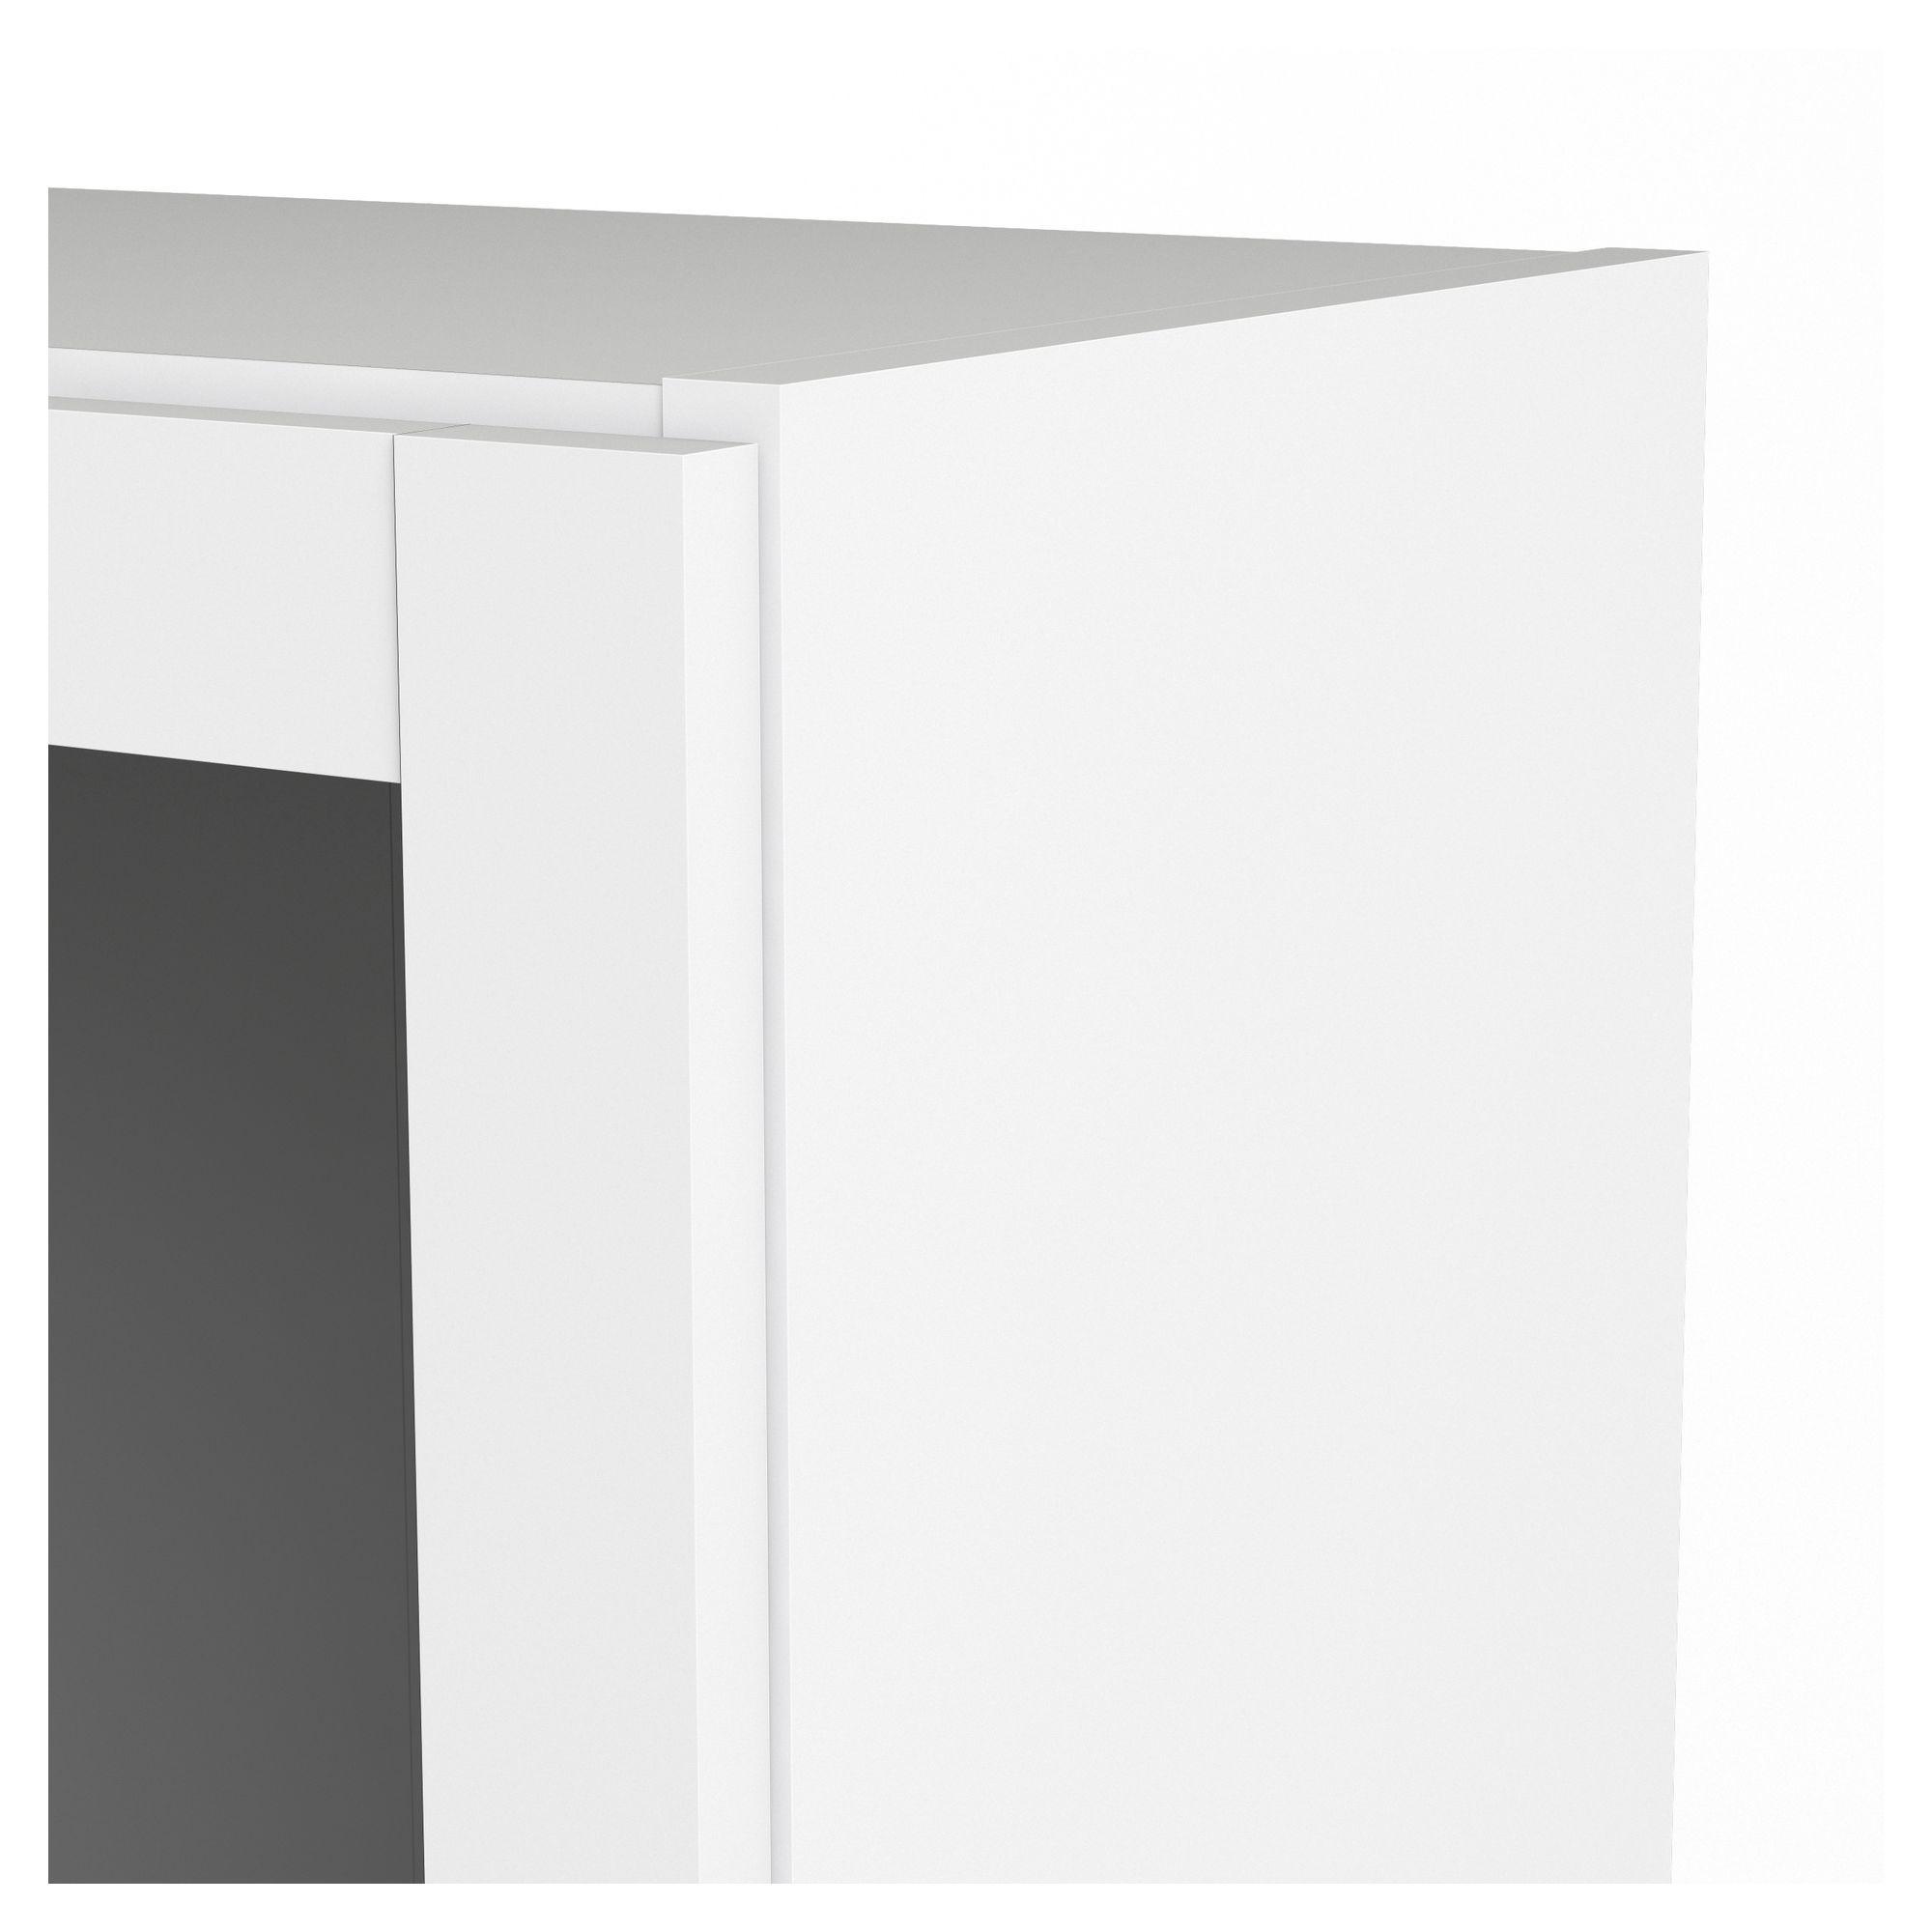 Basic Ekstra låge - Hvid m/glaslåge - Hvid Basic glaslåge